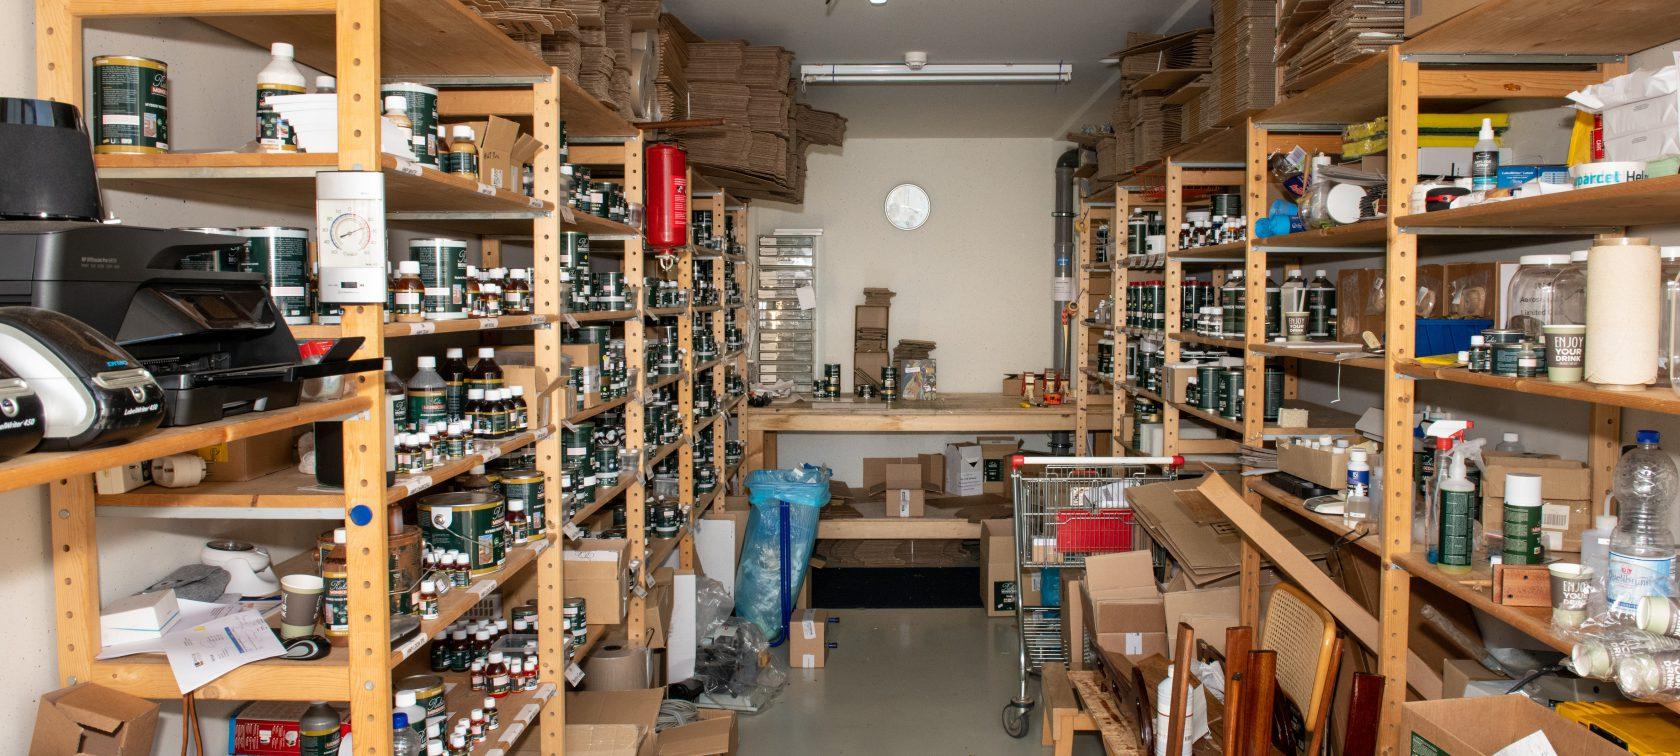 GaragePark - Opslag en werkruimte